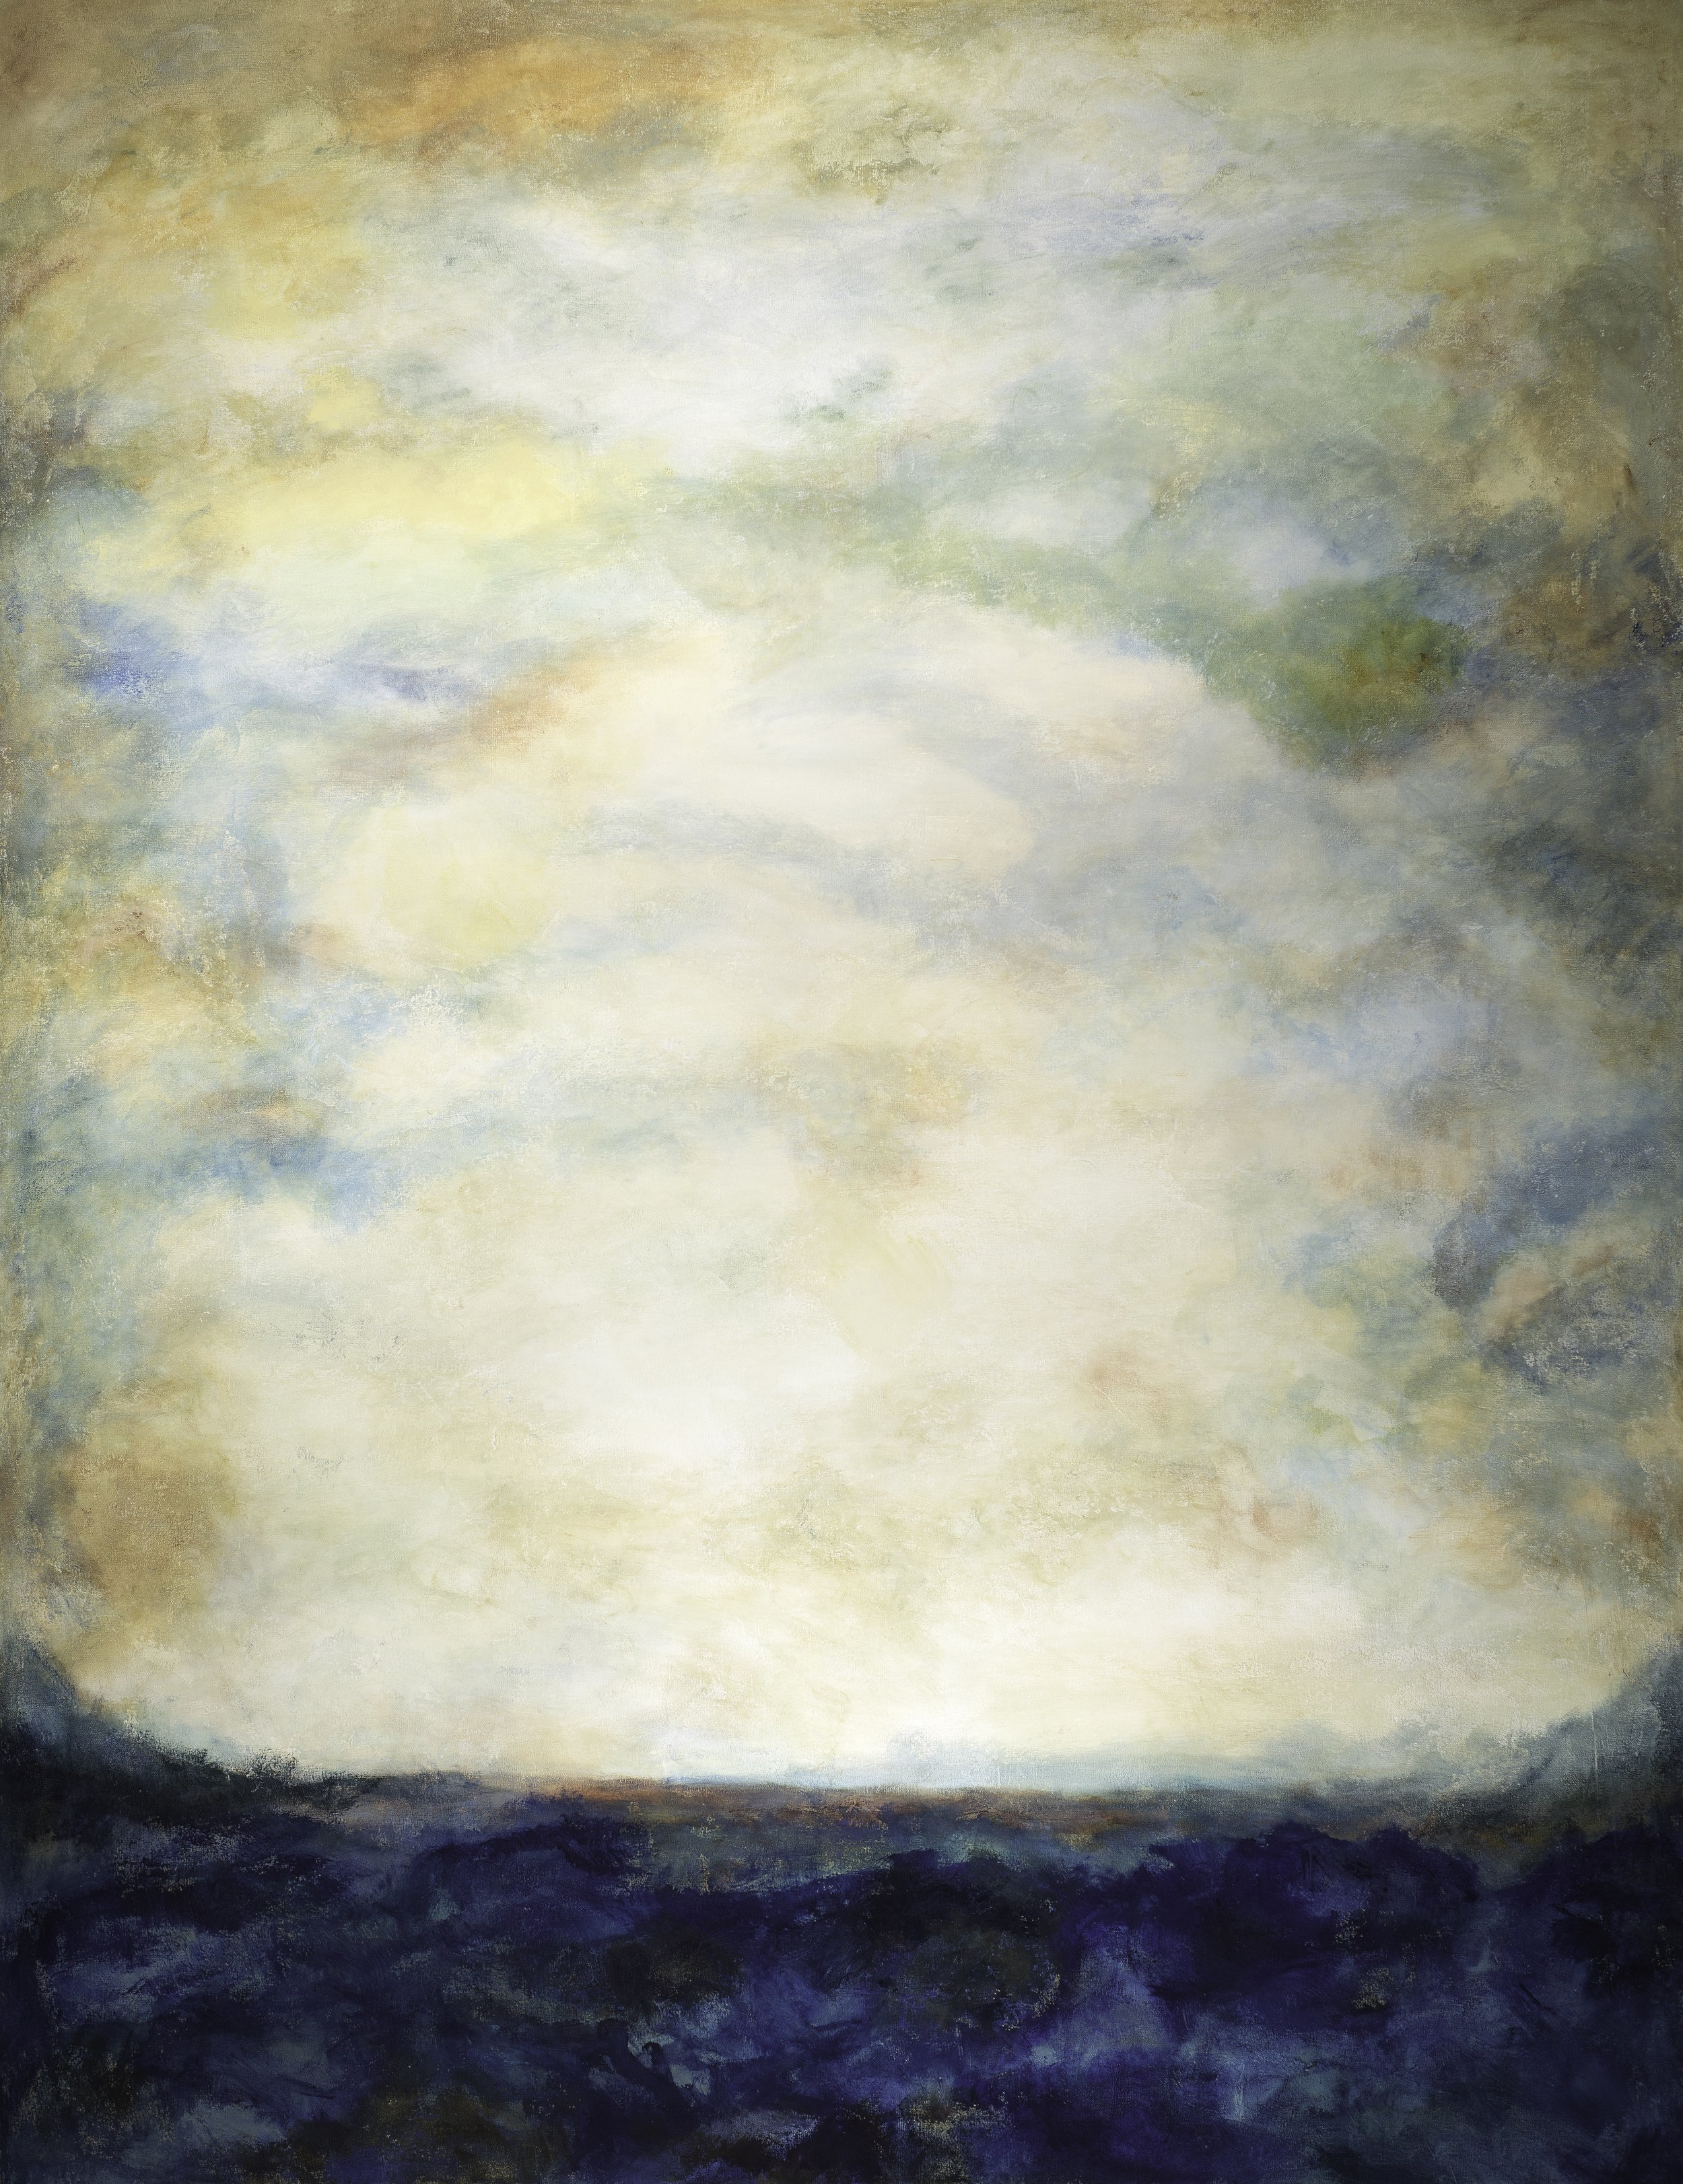 """Passages II"" - 78 x 60"